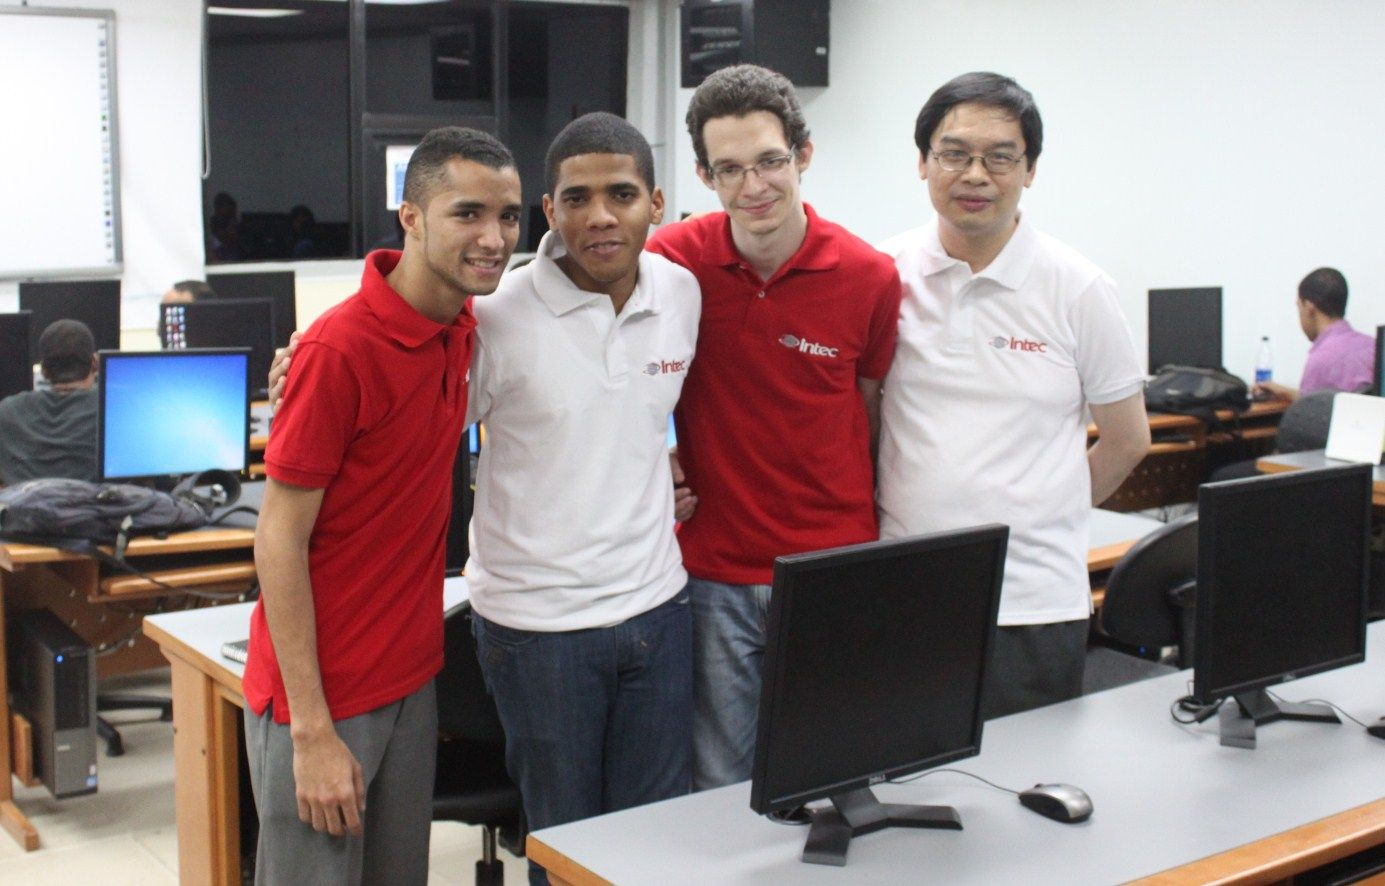 Equipo de INTEC representará al país en Competencia Mundial de Programación http://www.audienciaelectronica.net/2013/11/18/equipo-de-intec-representara-al-pais-en-competencia-mundial-de-programacion/